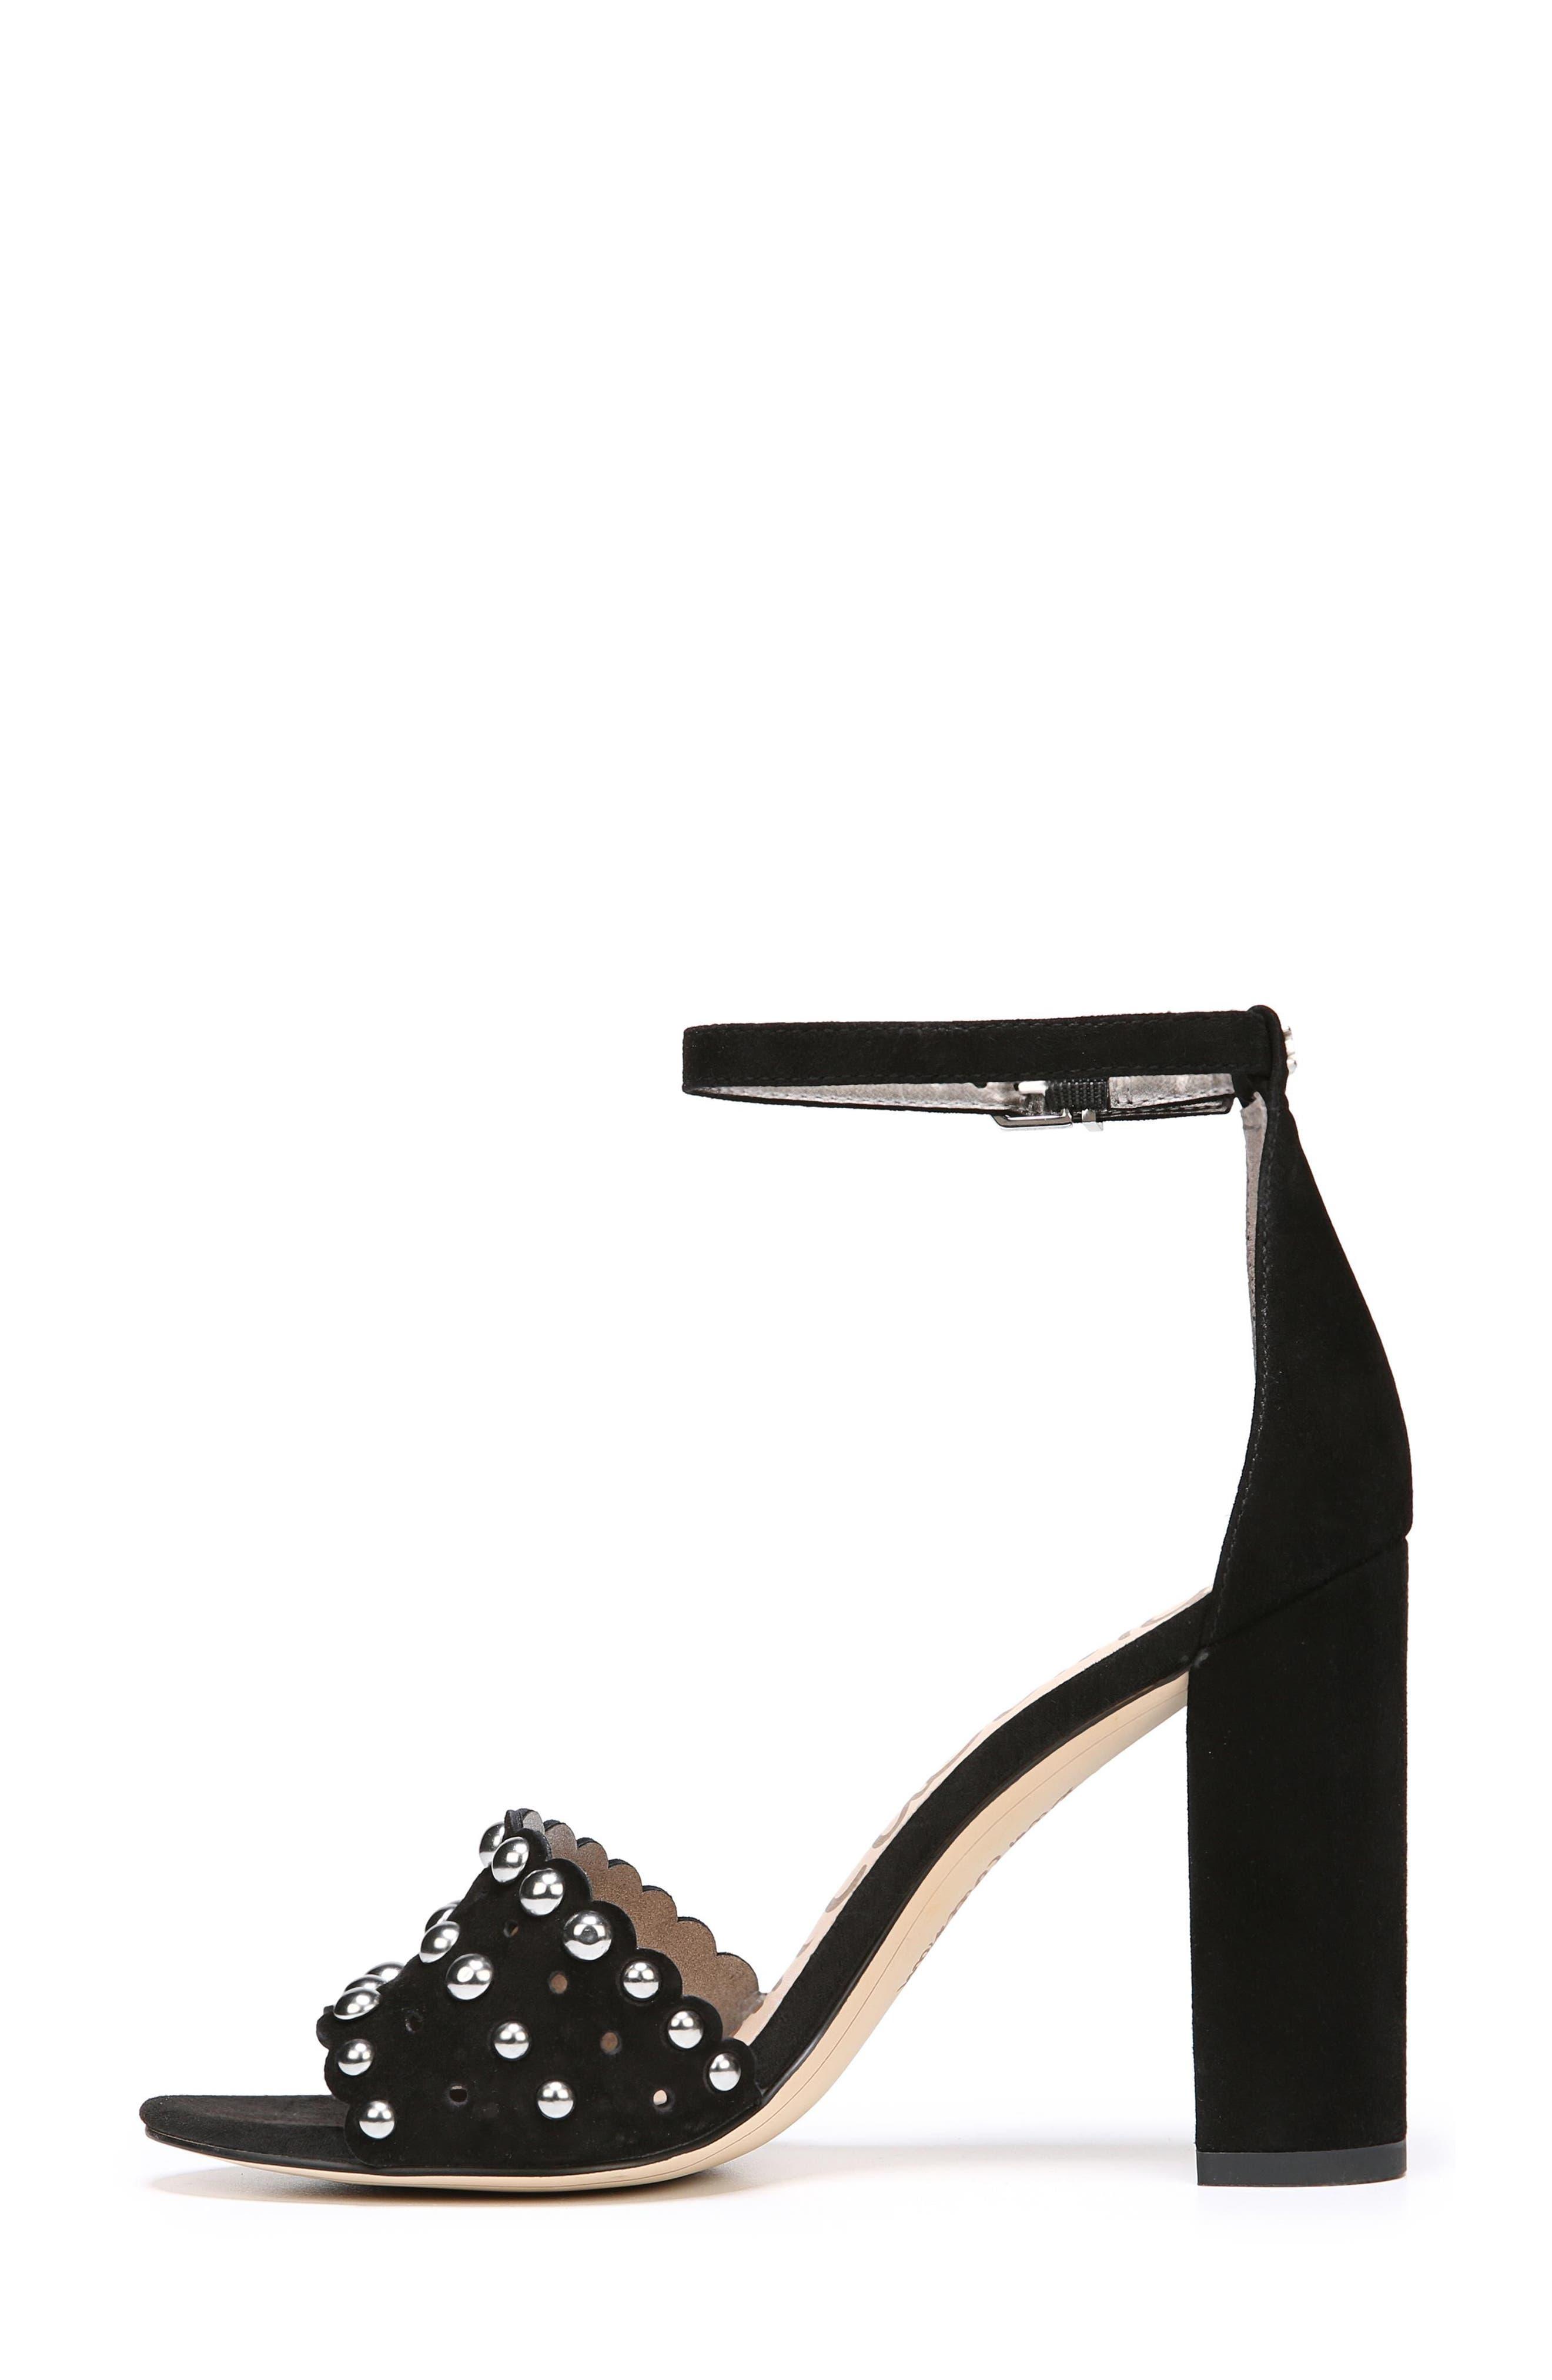 Yaria Studded Block Heel Sandal,                             Alternate thumbnail 3, color,                             001